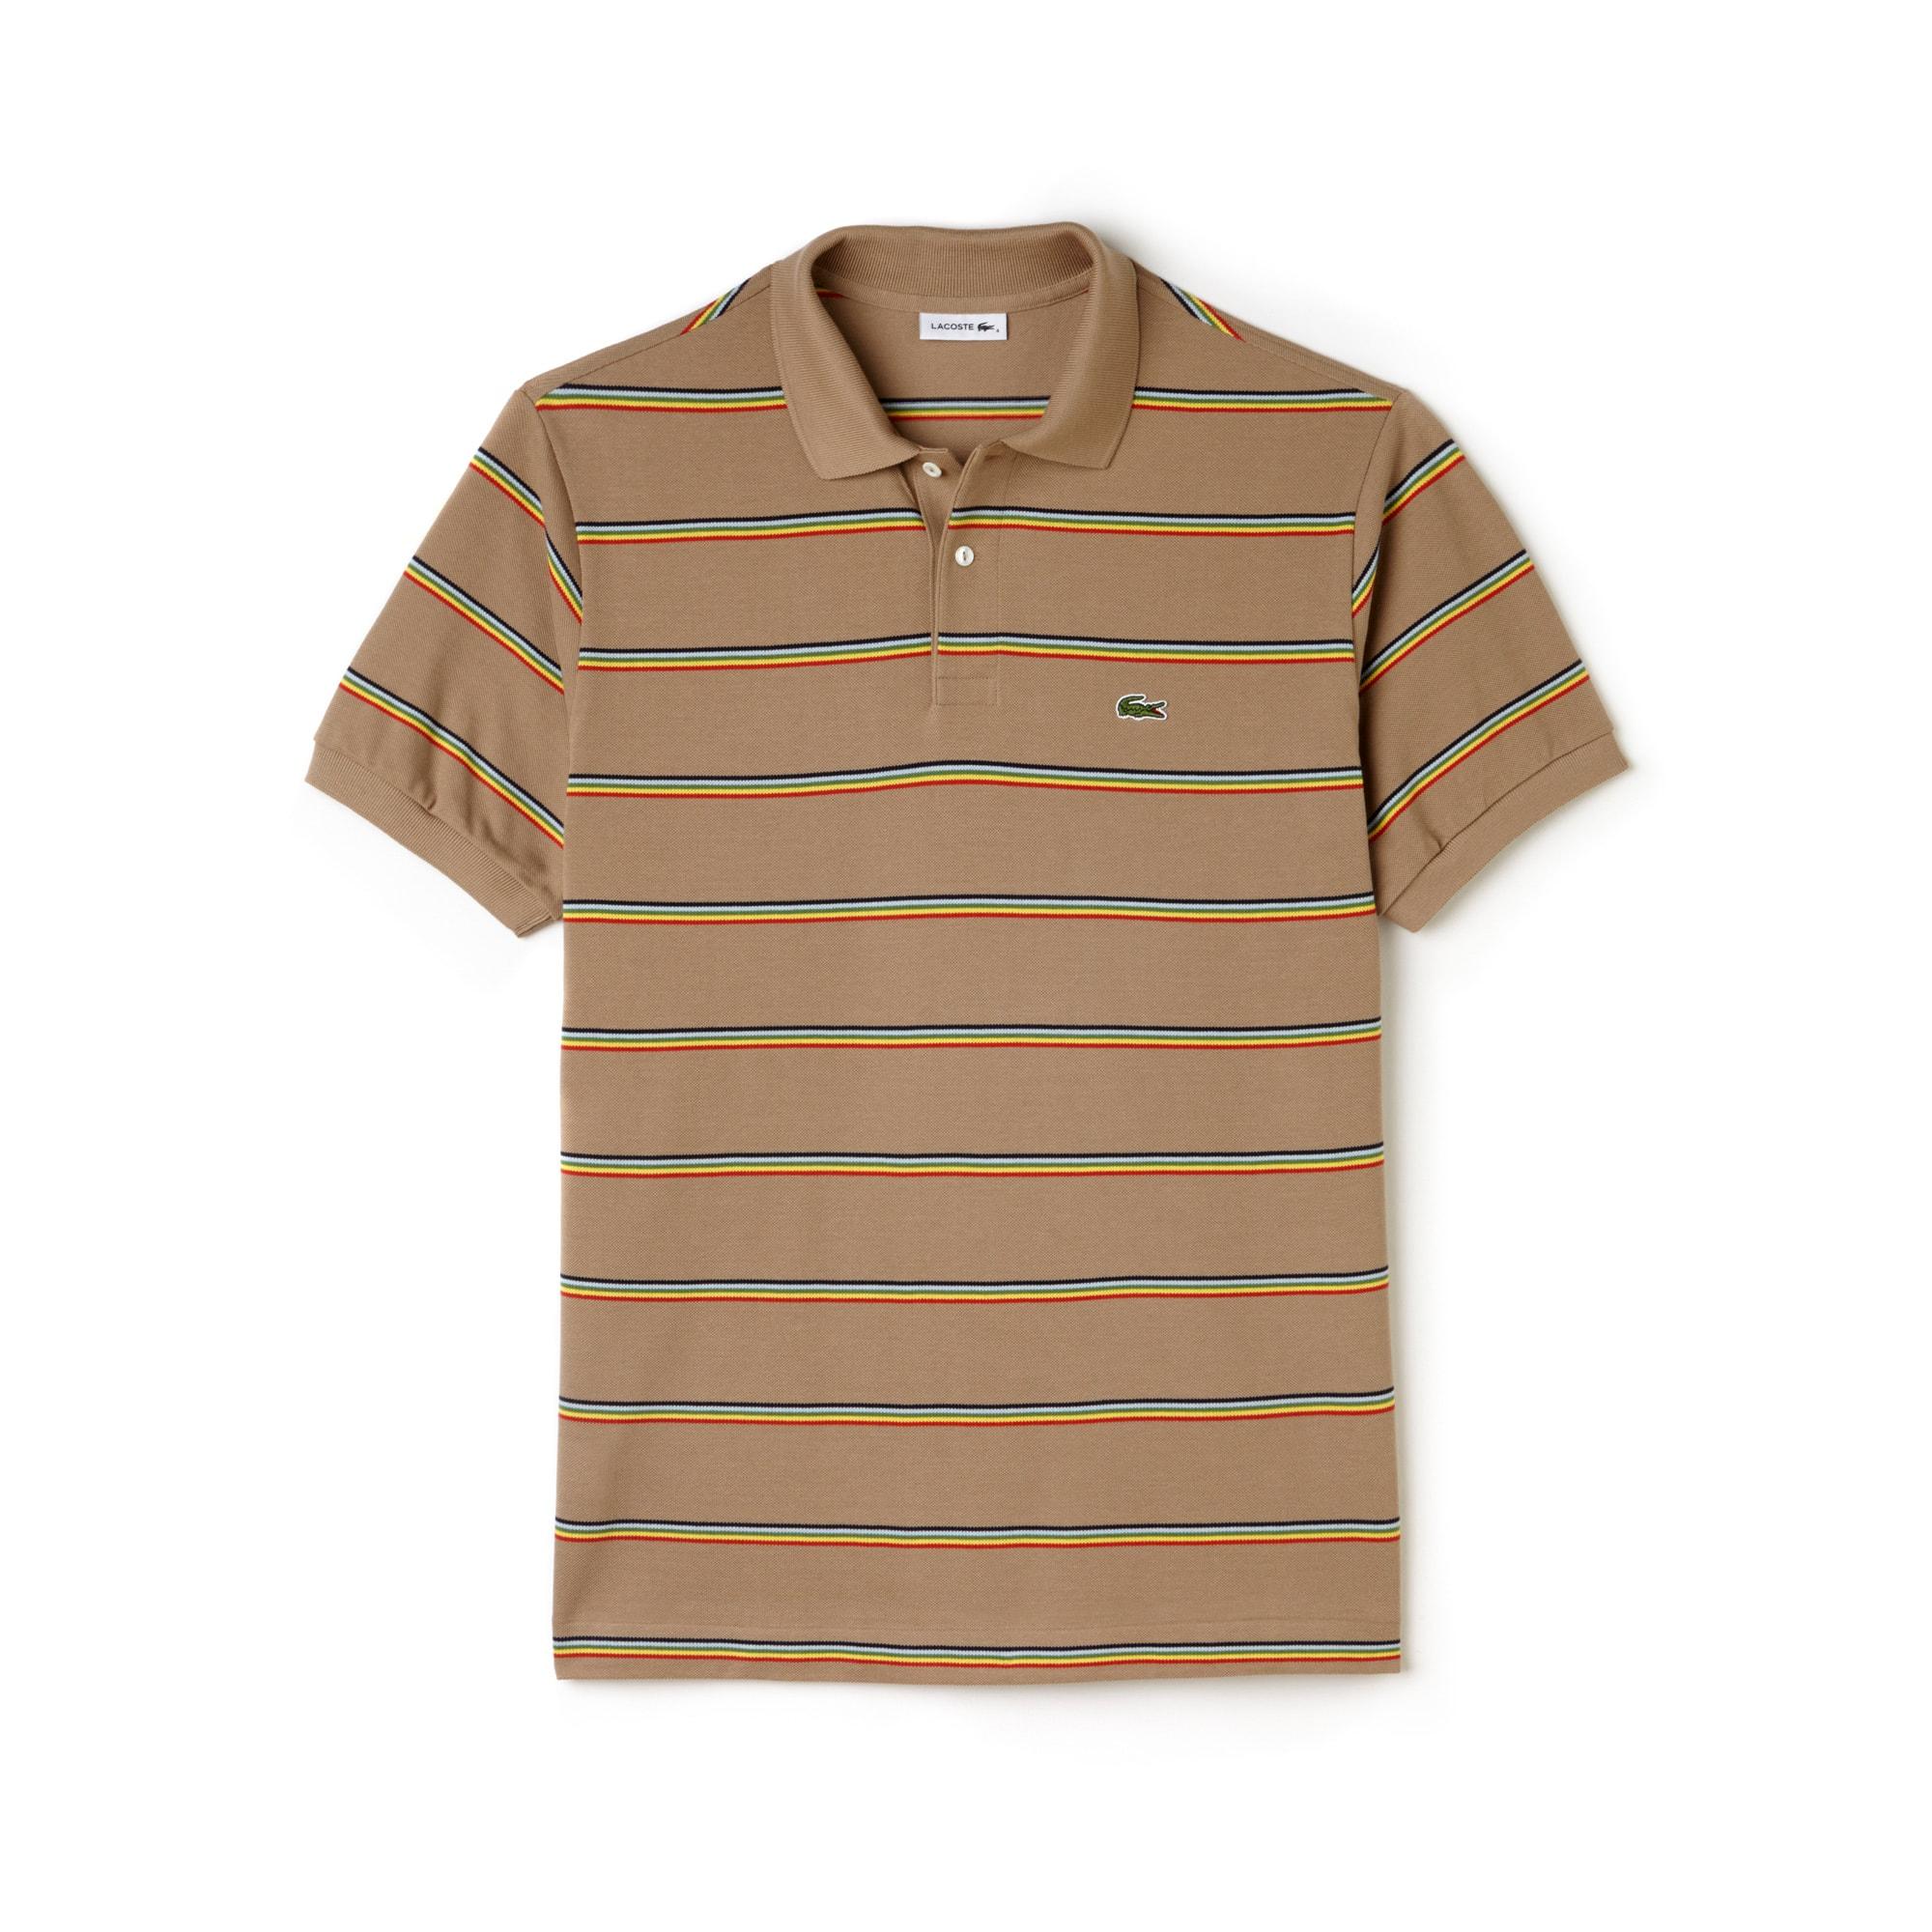 Men's Fashion Show Petit Piqué Oversized Striped Polo Shirt